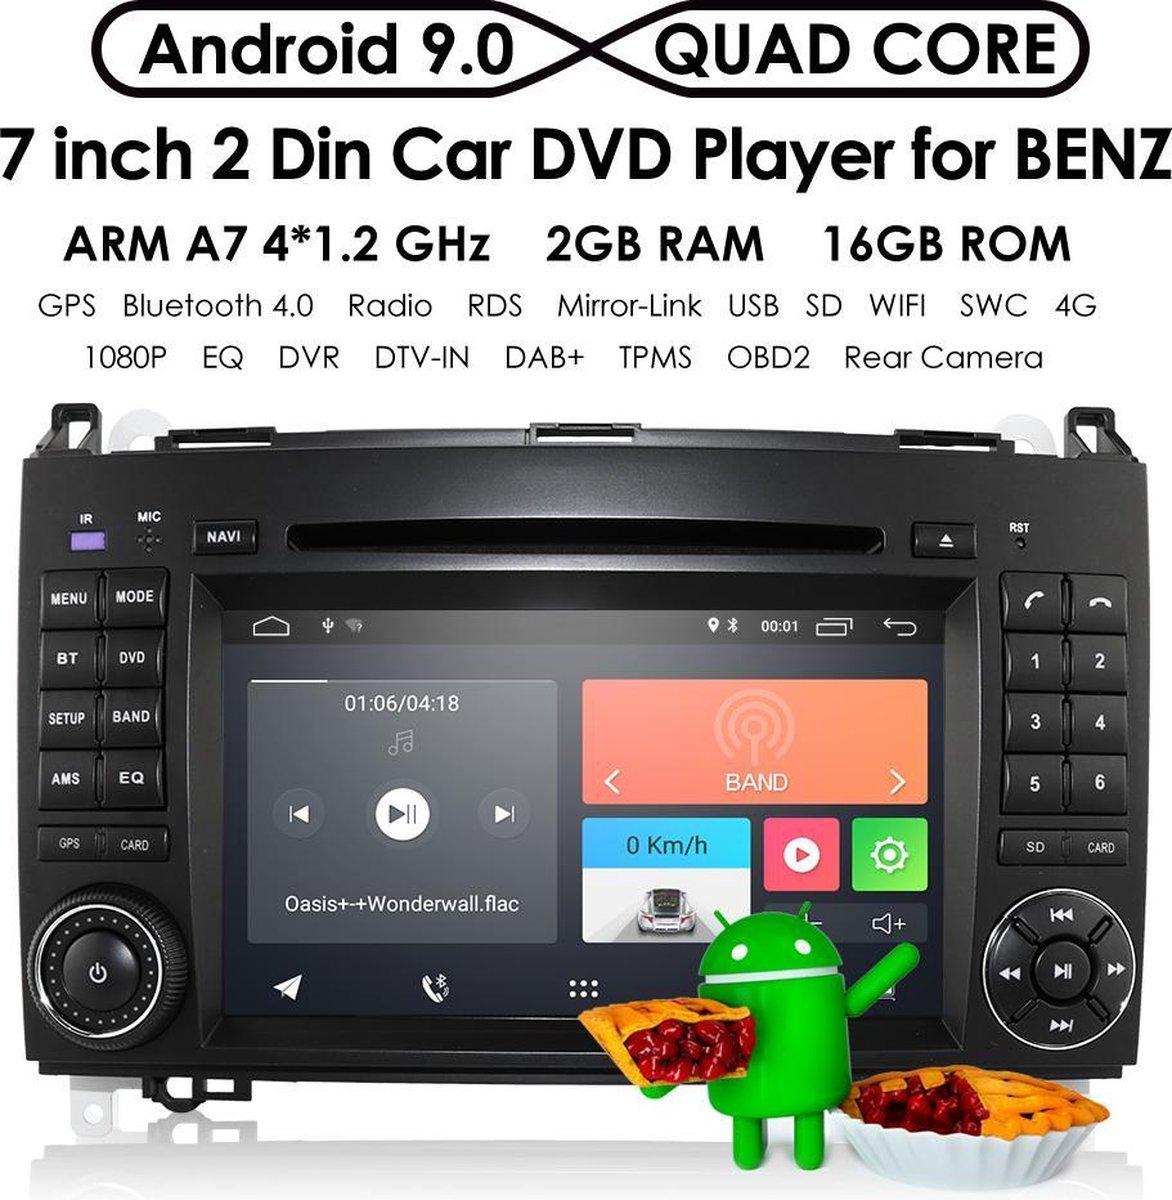 Mercedes Benz A B V Sprinter Vito Viano Klasse W169 W245 W639 W906 2004 t/m 2014 Navigatiesysteem | Volkswagen Crafter | CAN-BUS met Bluetooth Autoradio Aux en USB - Dubbel din - Android 10 – Met AchteruitrijCamera & USB - 4 core 2GB RAM 16GB ROM